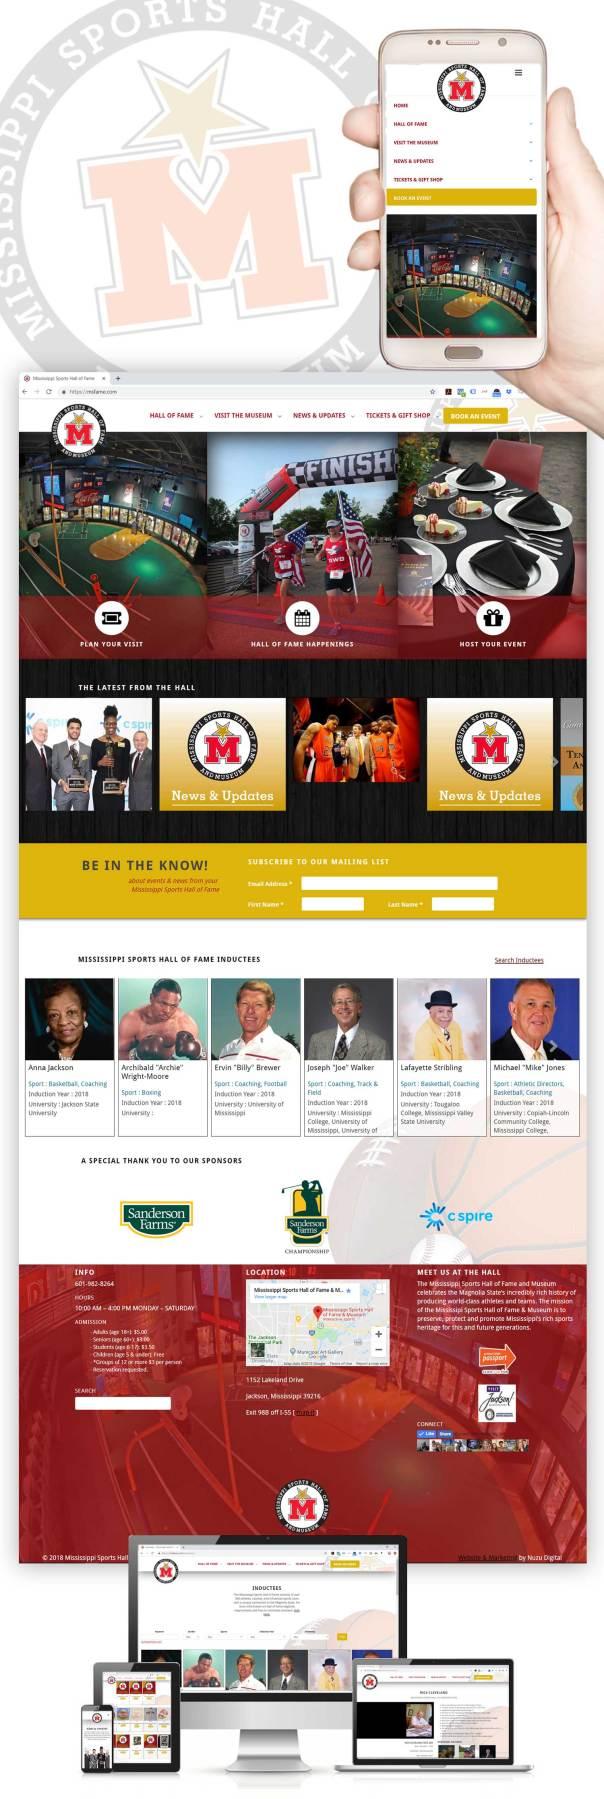 Responsive website design for the Mississippi Sports Hall of Fame